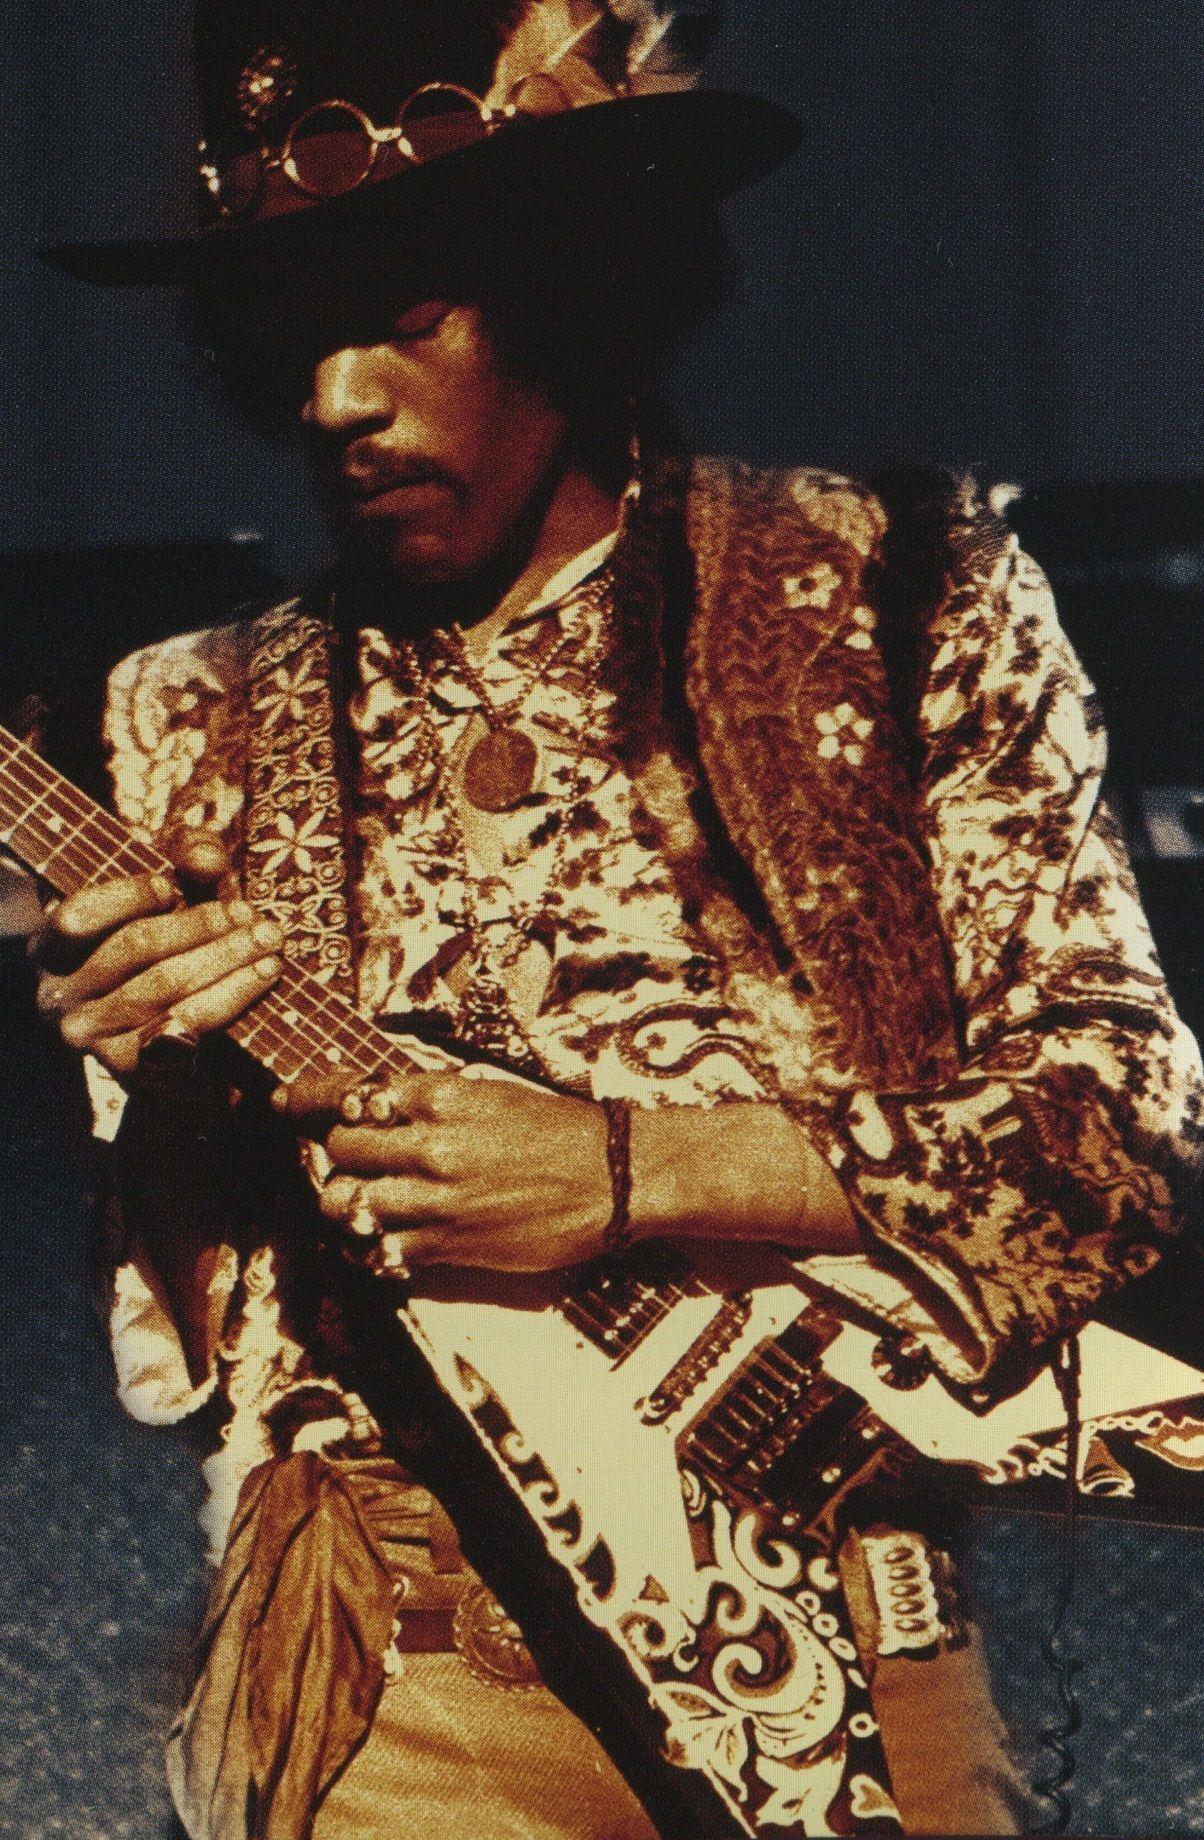 Love this pic of Jimi Hendrix